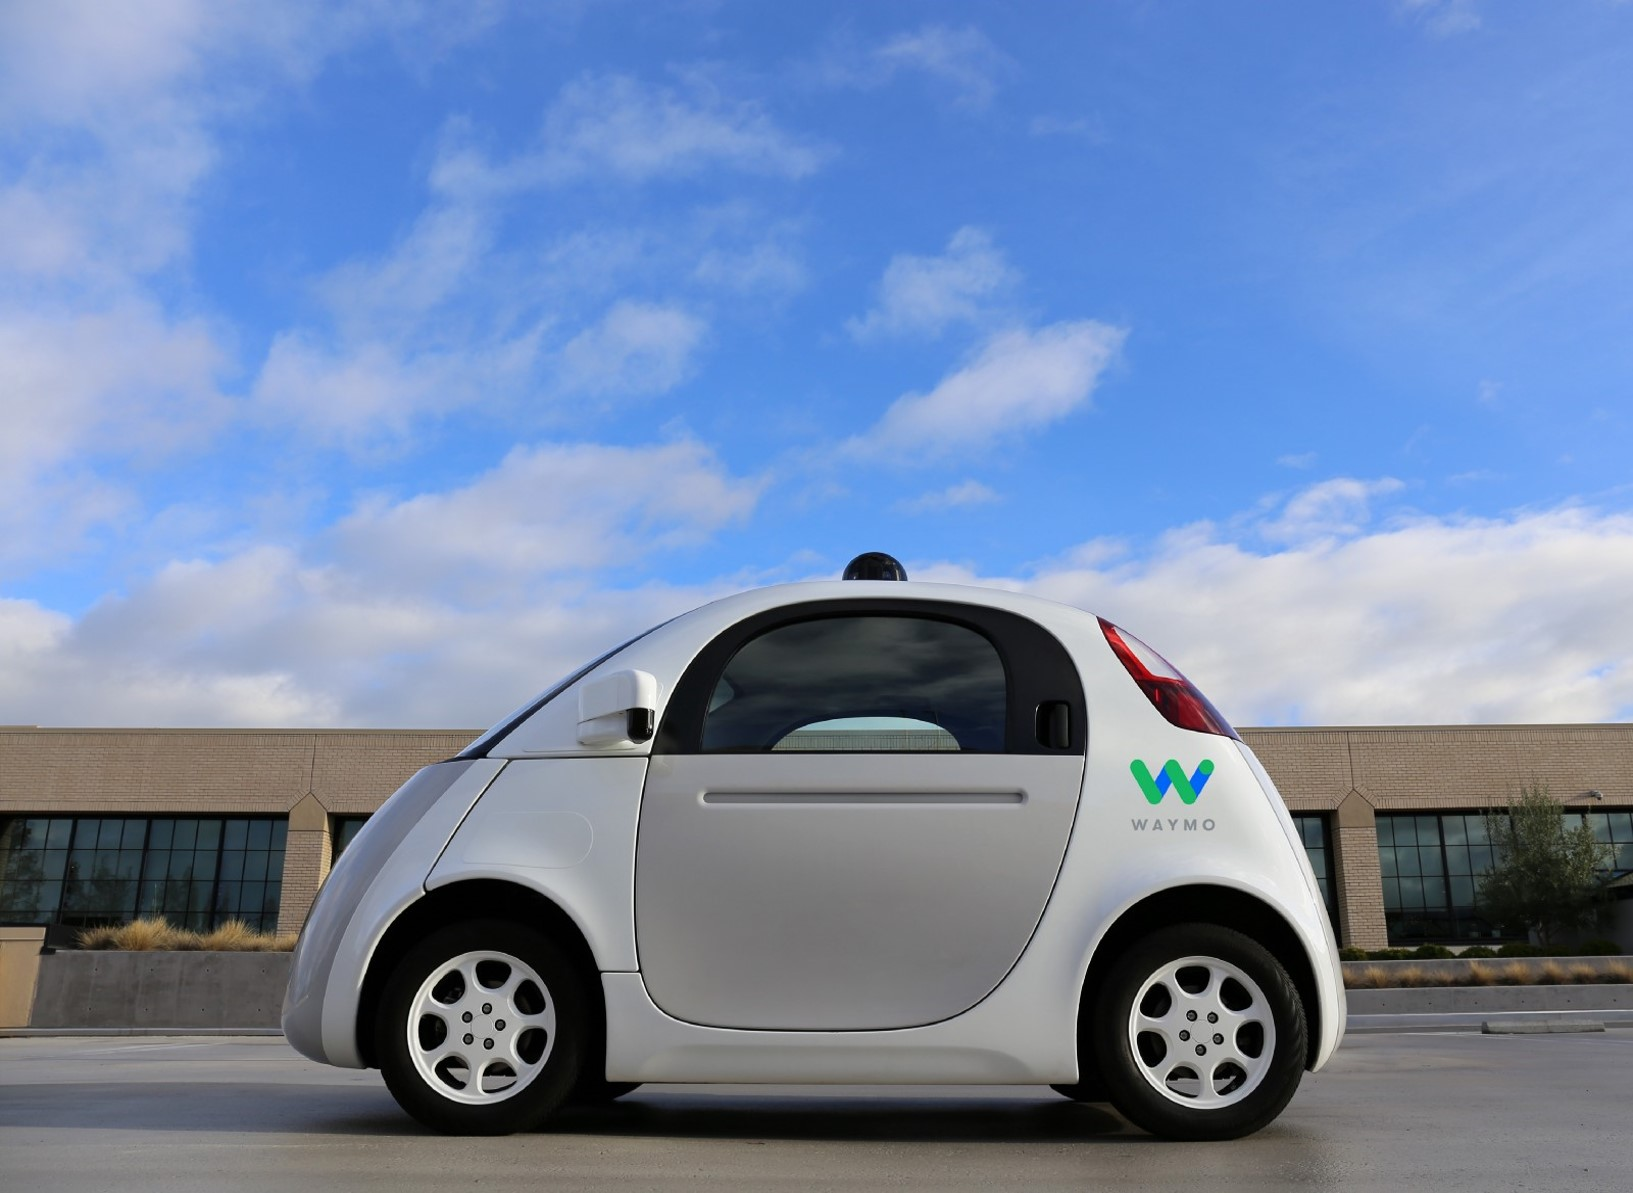 Waymo - Artificial Intelligence Applications - Edureka